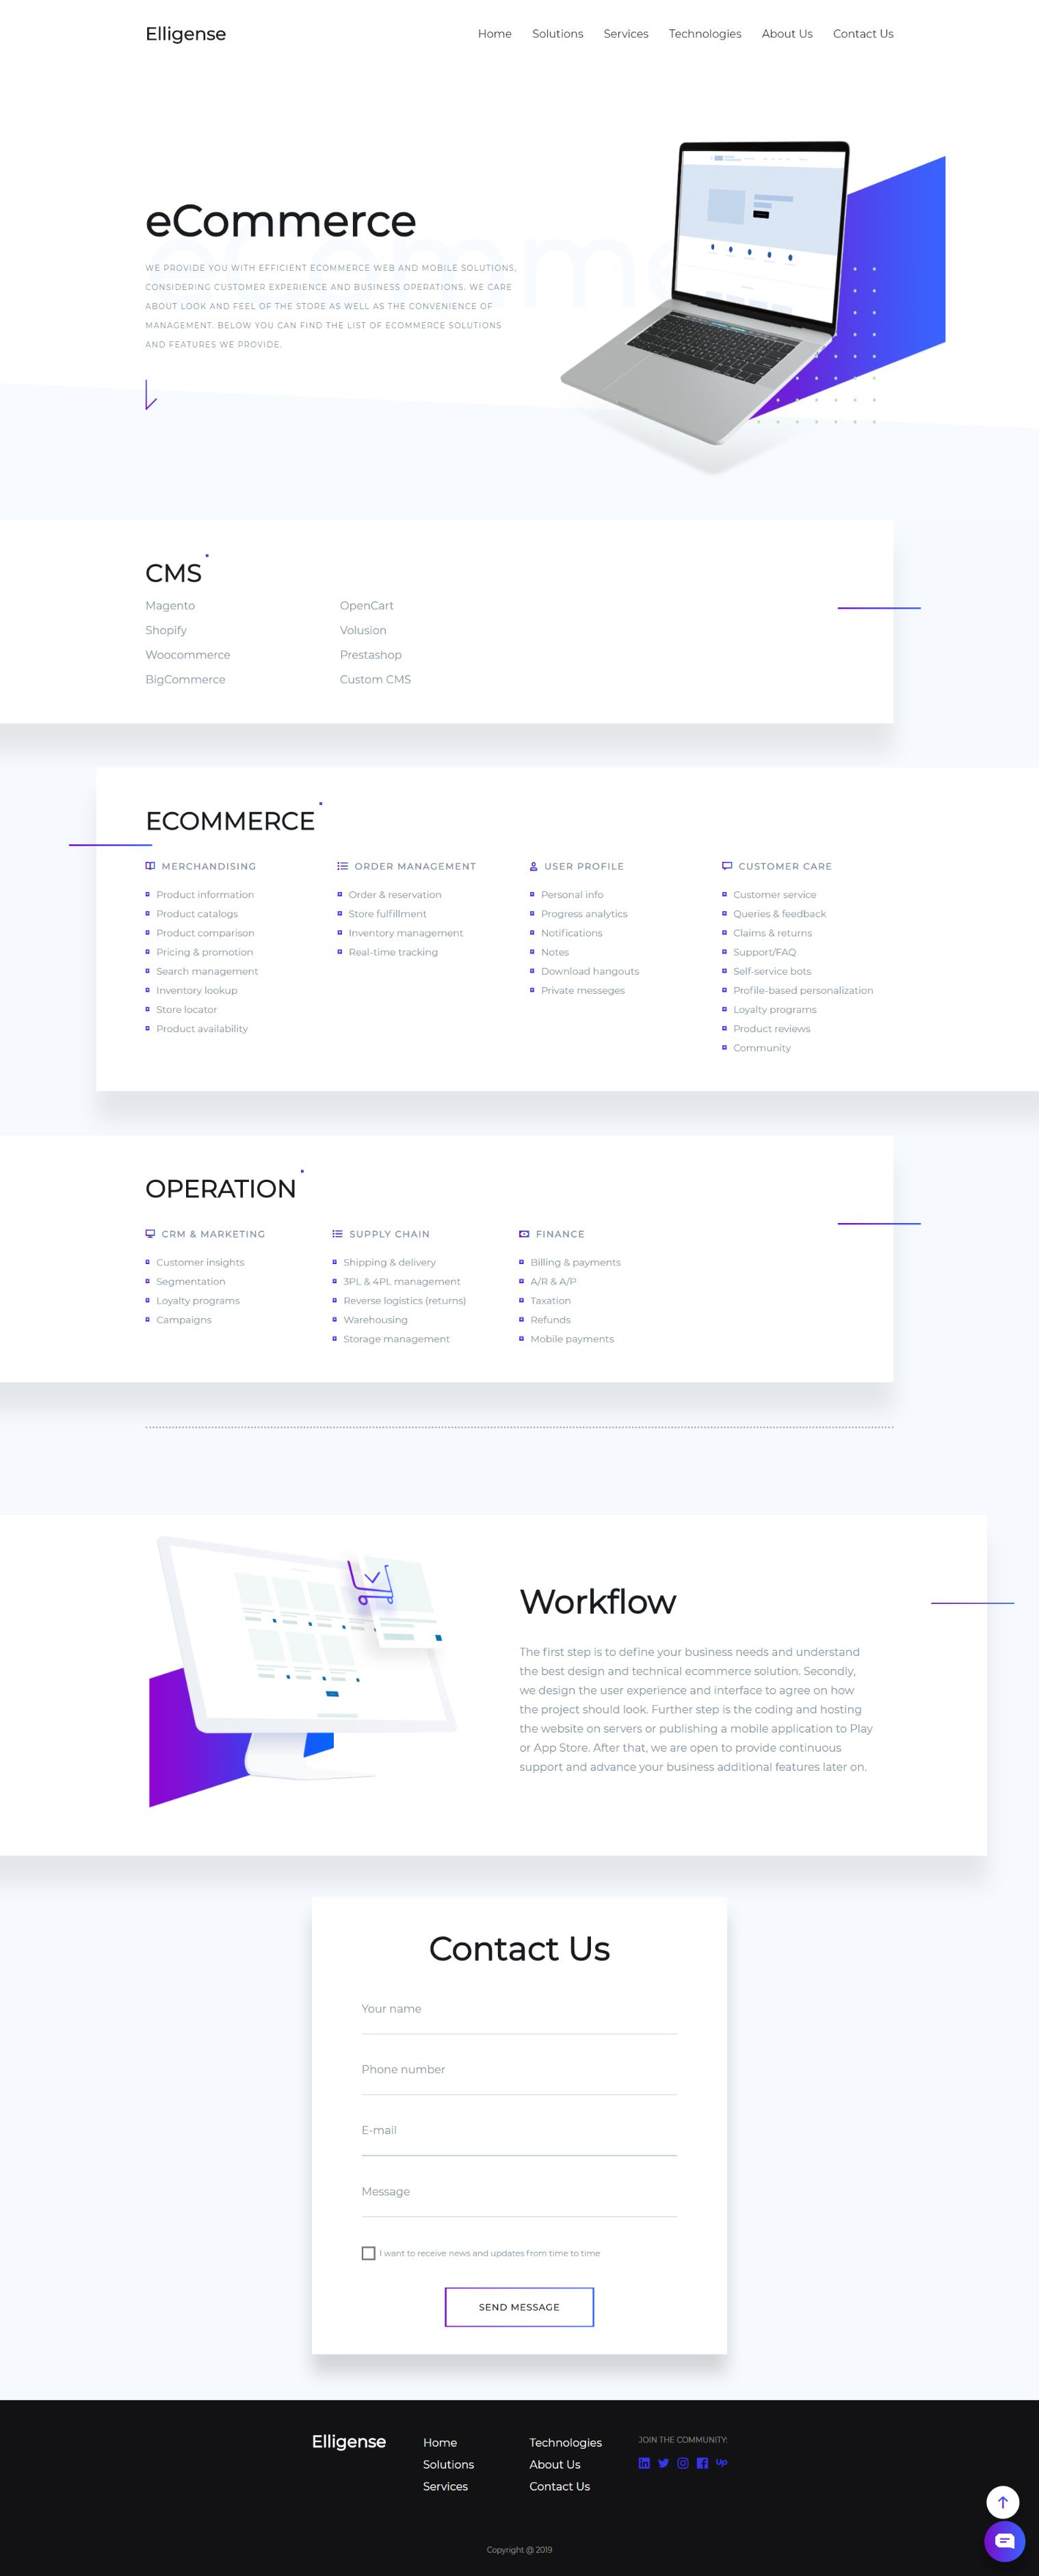 Modern Trendy And Fresh Ecommerce Solutions Landing Page Web Design Inspiration Web Design Corporate Website Design Web Design Quotes